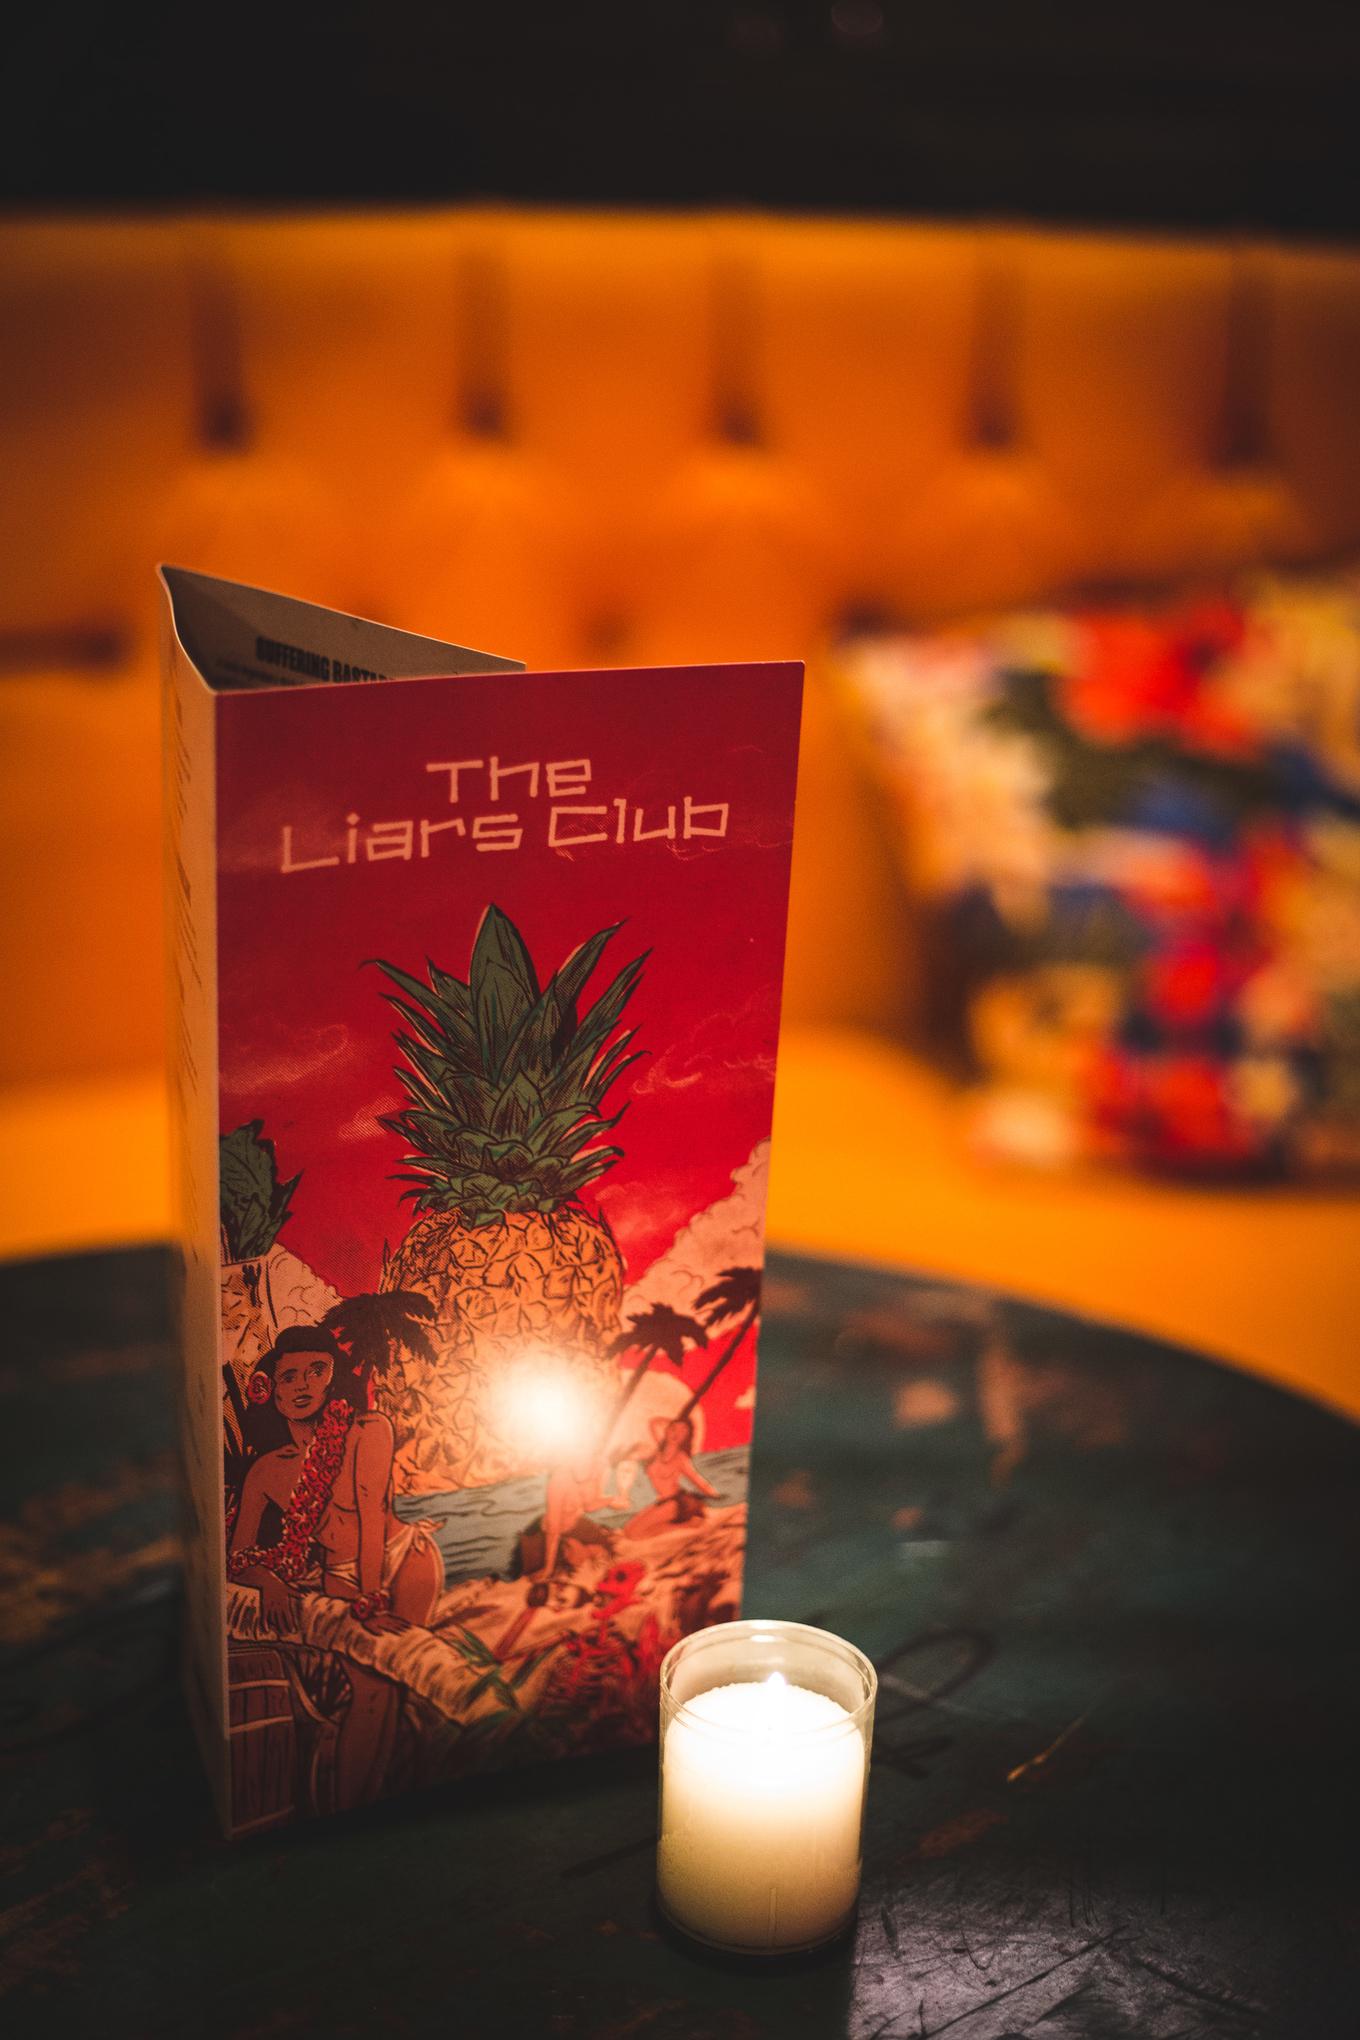 Liar's Club image 15